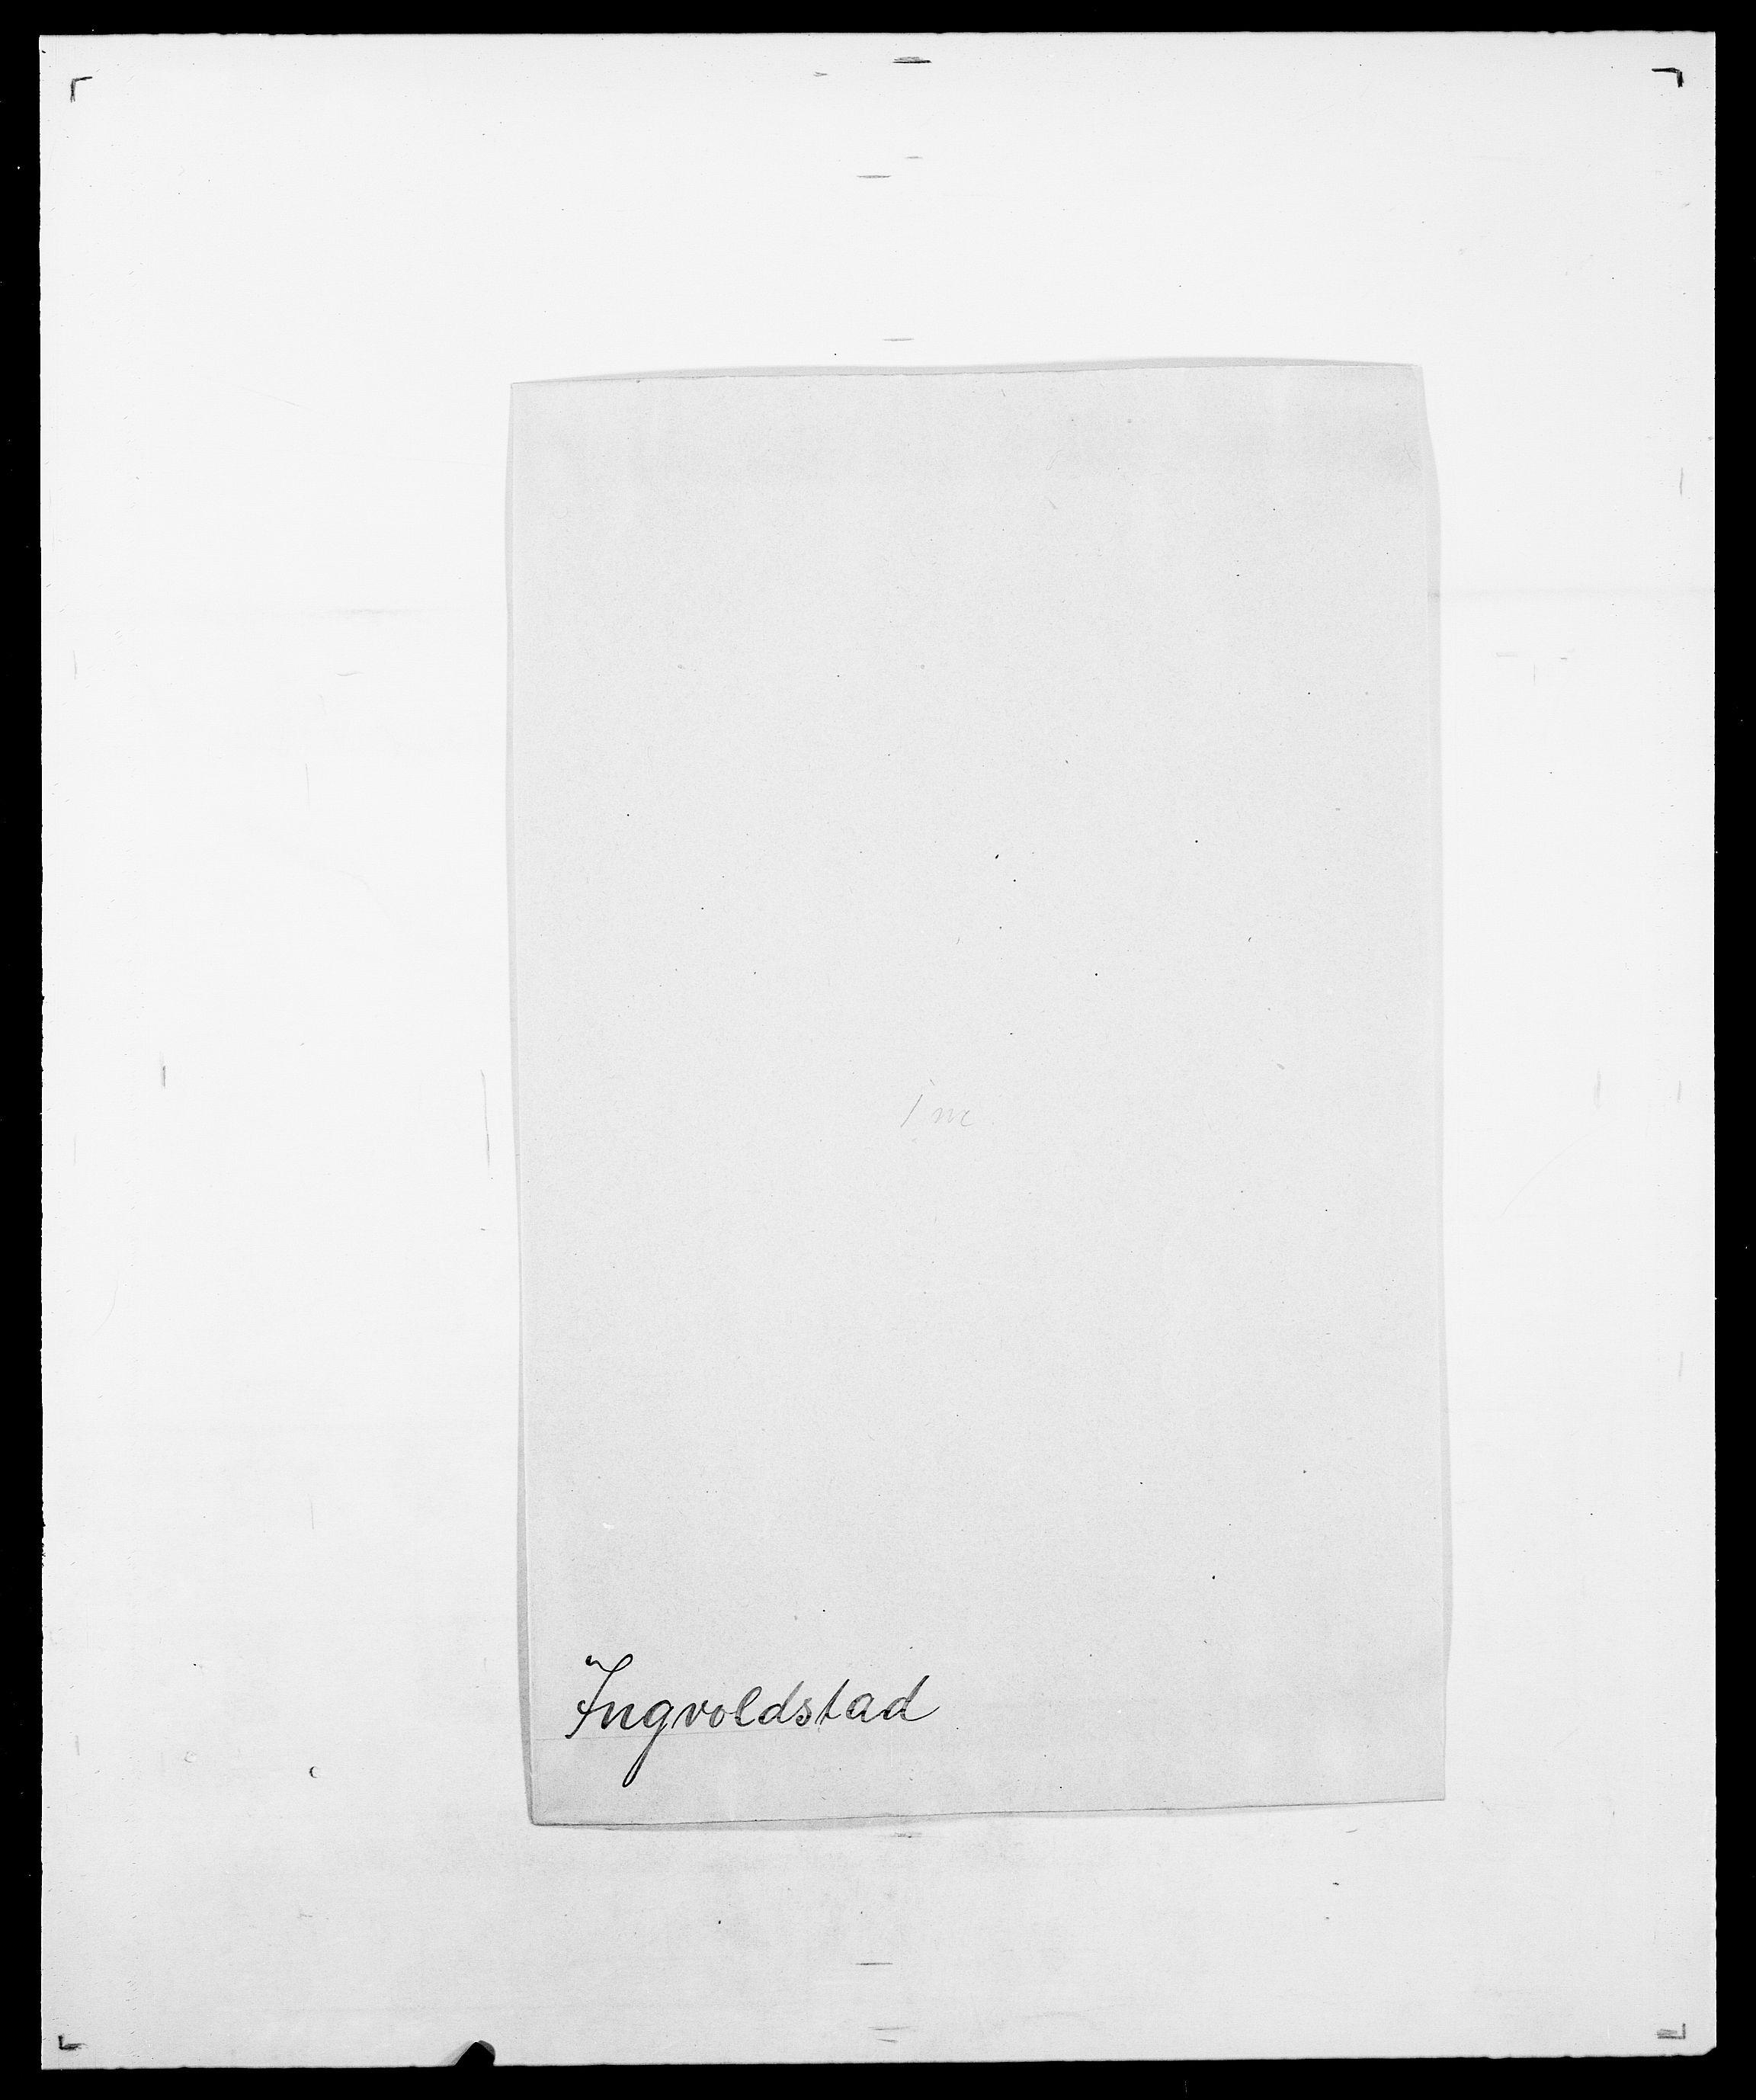 SAO, Delgobe, Charles Antoine - samling, D/Da/L0019: van der Hude - Joys, s. 801